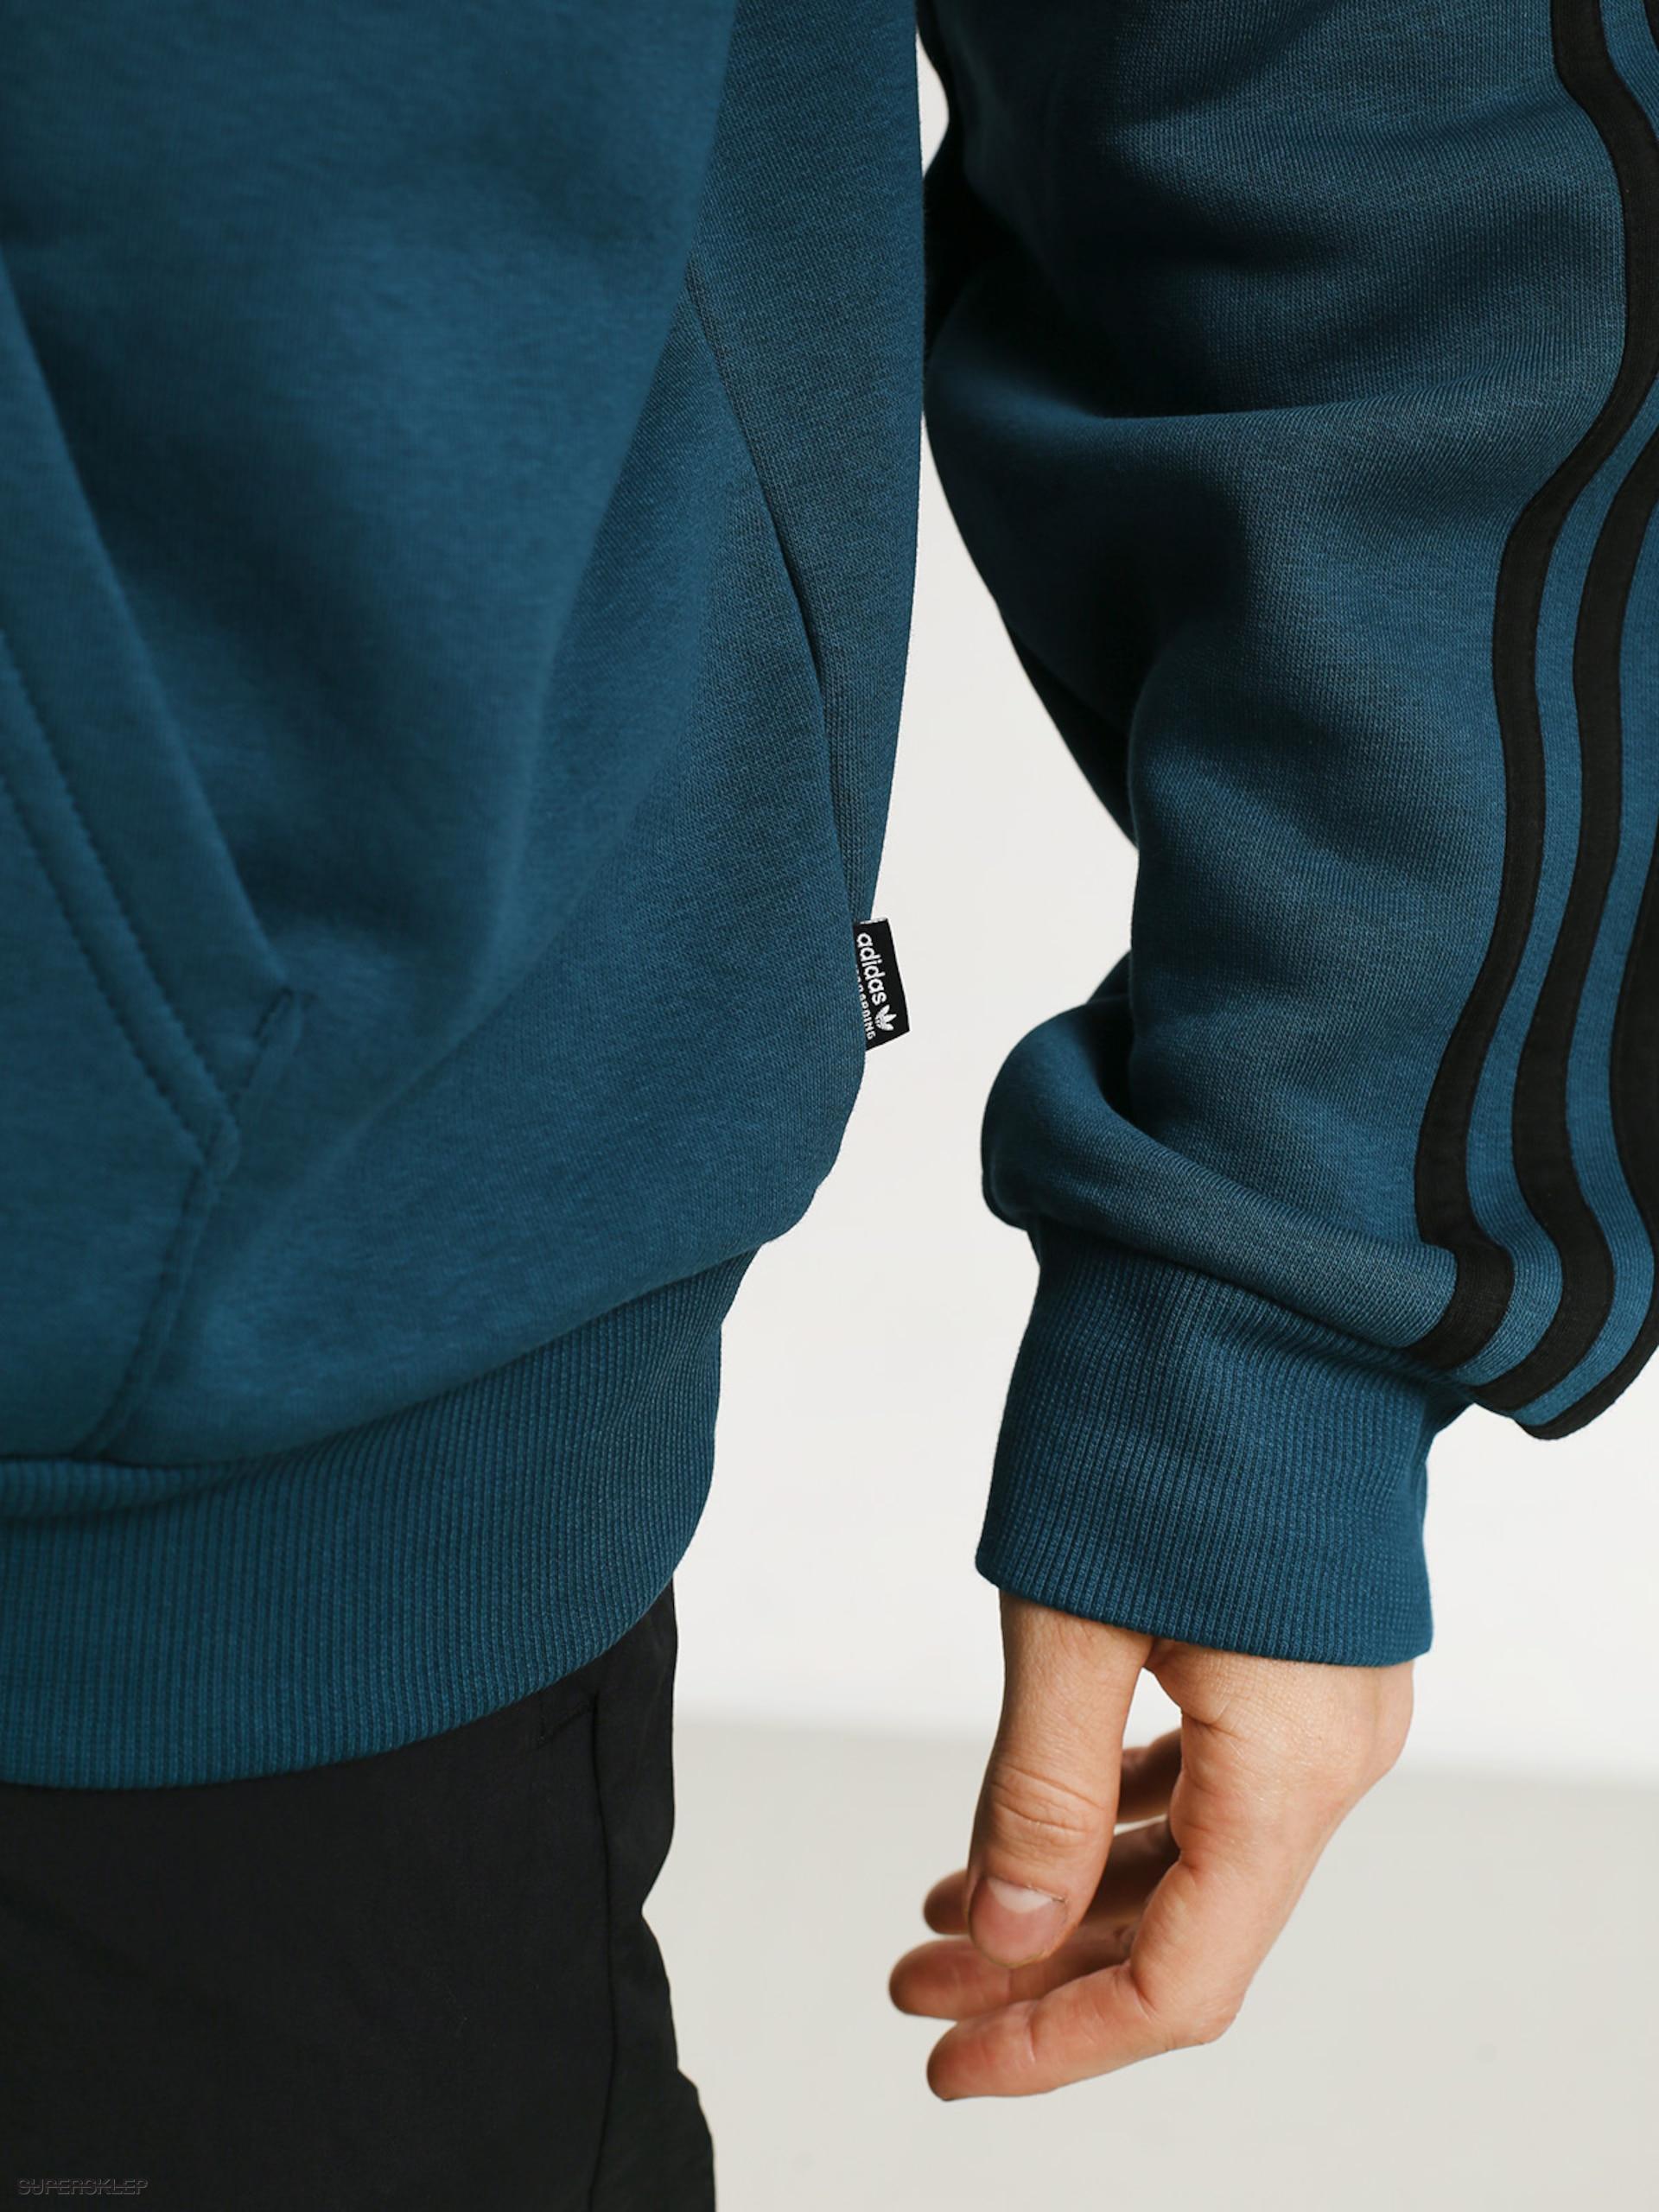 Bluza adidas Manolesarthd (tech mineralblack)